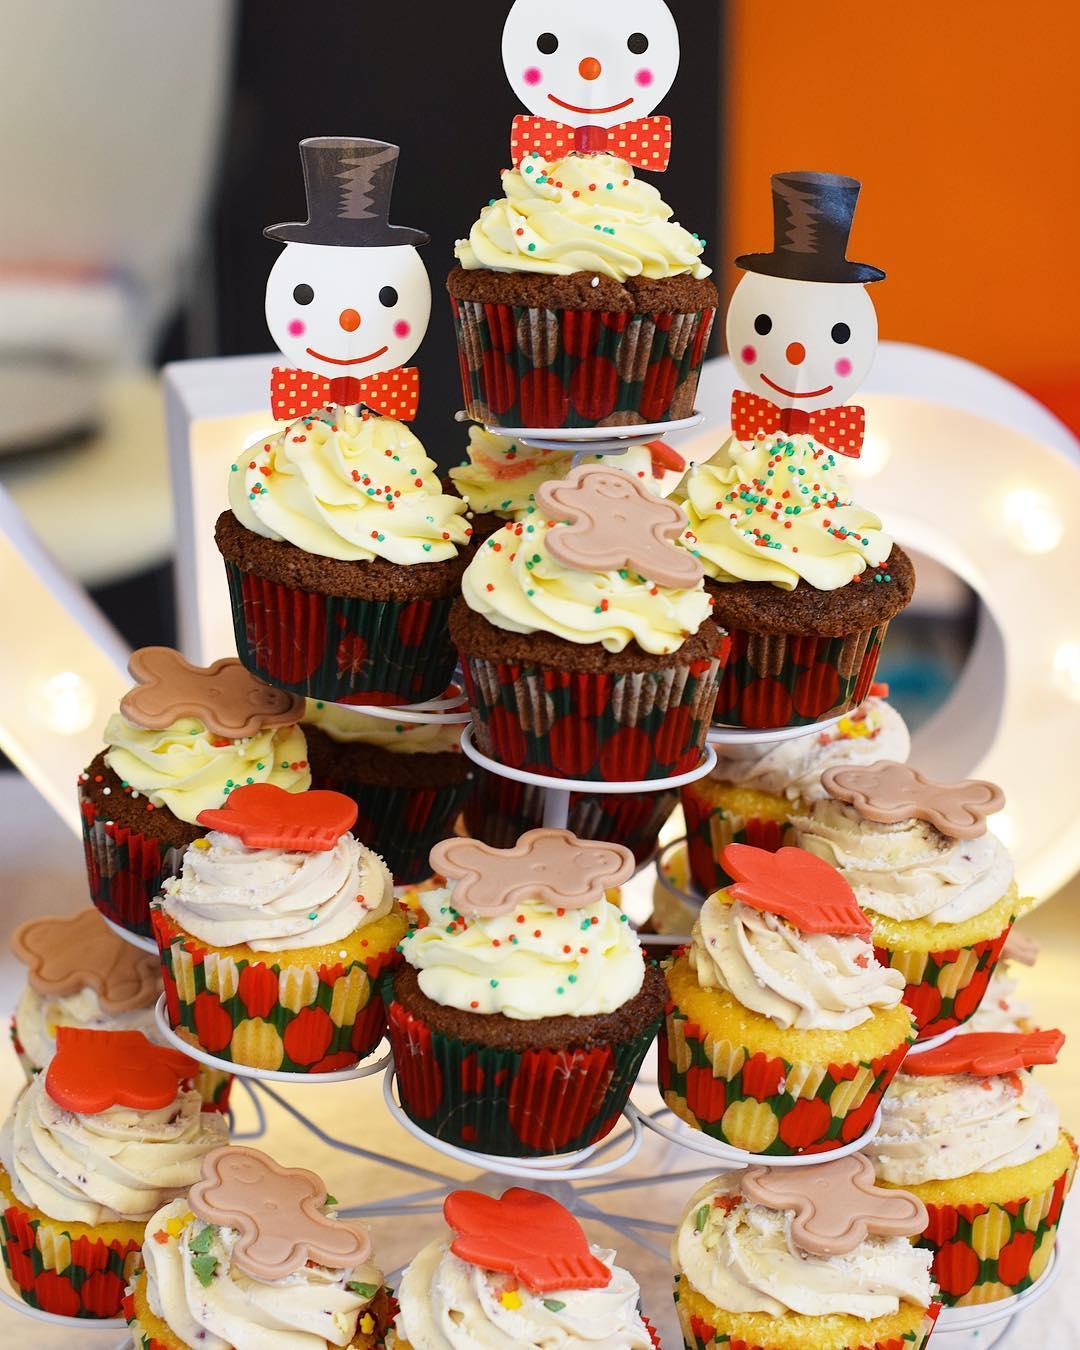 Quand ta cOpine est un génie de la pâtisserie... Bin tu dis adieu bikini ! Merci Mary @vanilleouchocolat_montpellier ❤️ #teambouboule . ➕ Vanille ou Chocolat • pâtisserie . ? Montpellier (34)?? . _________________ #vanilleouchocolat #vanilleouchocolat_montpellier #montpellier #patisserie #cupcakes #food #foodporn #foodlover #fooding #foodblogger #blogfood #pintademontpellier